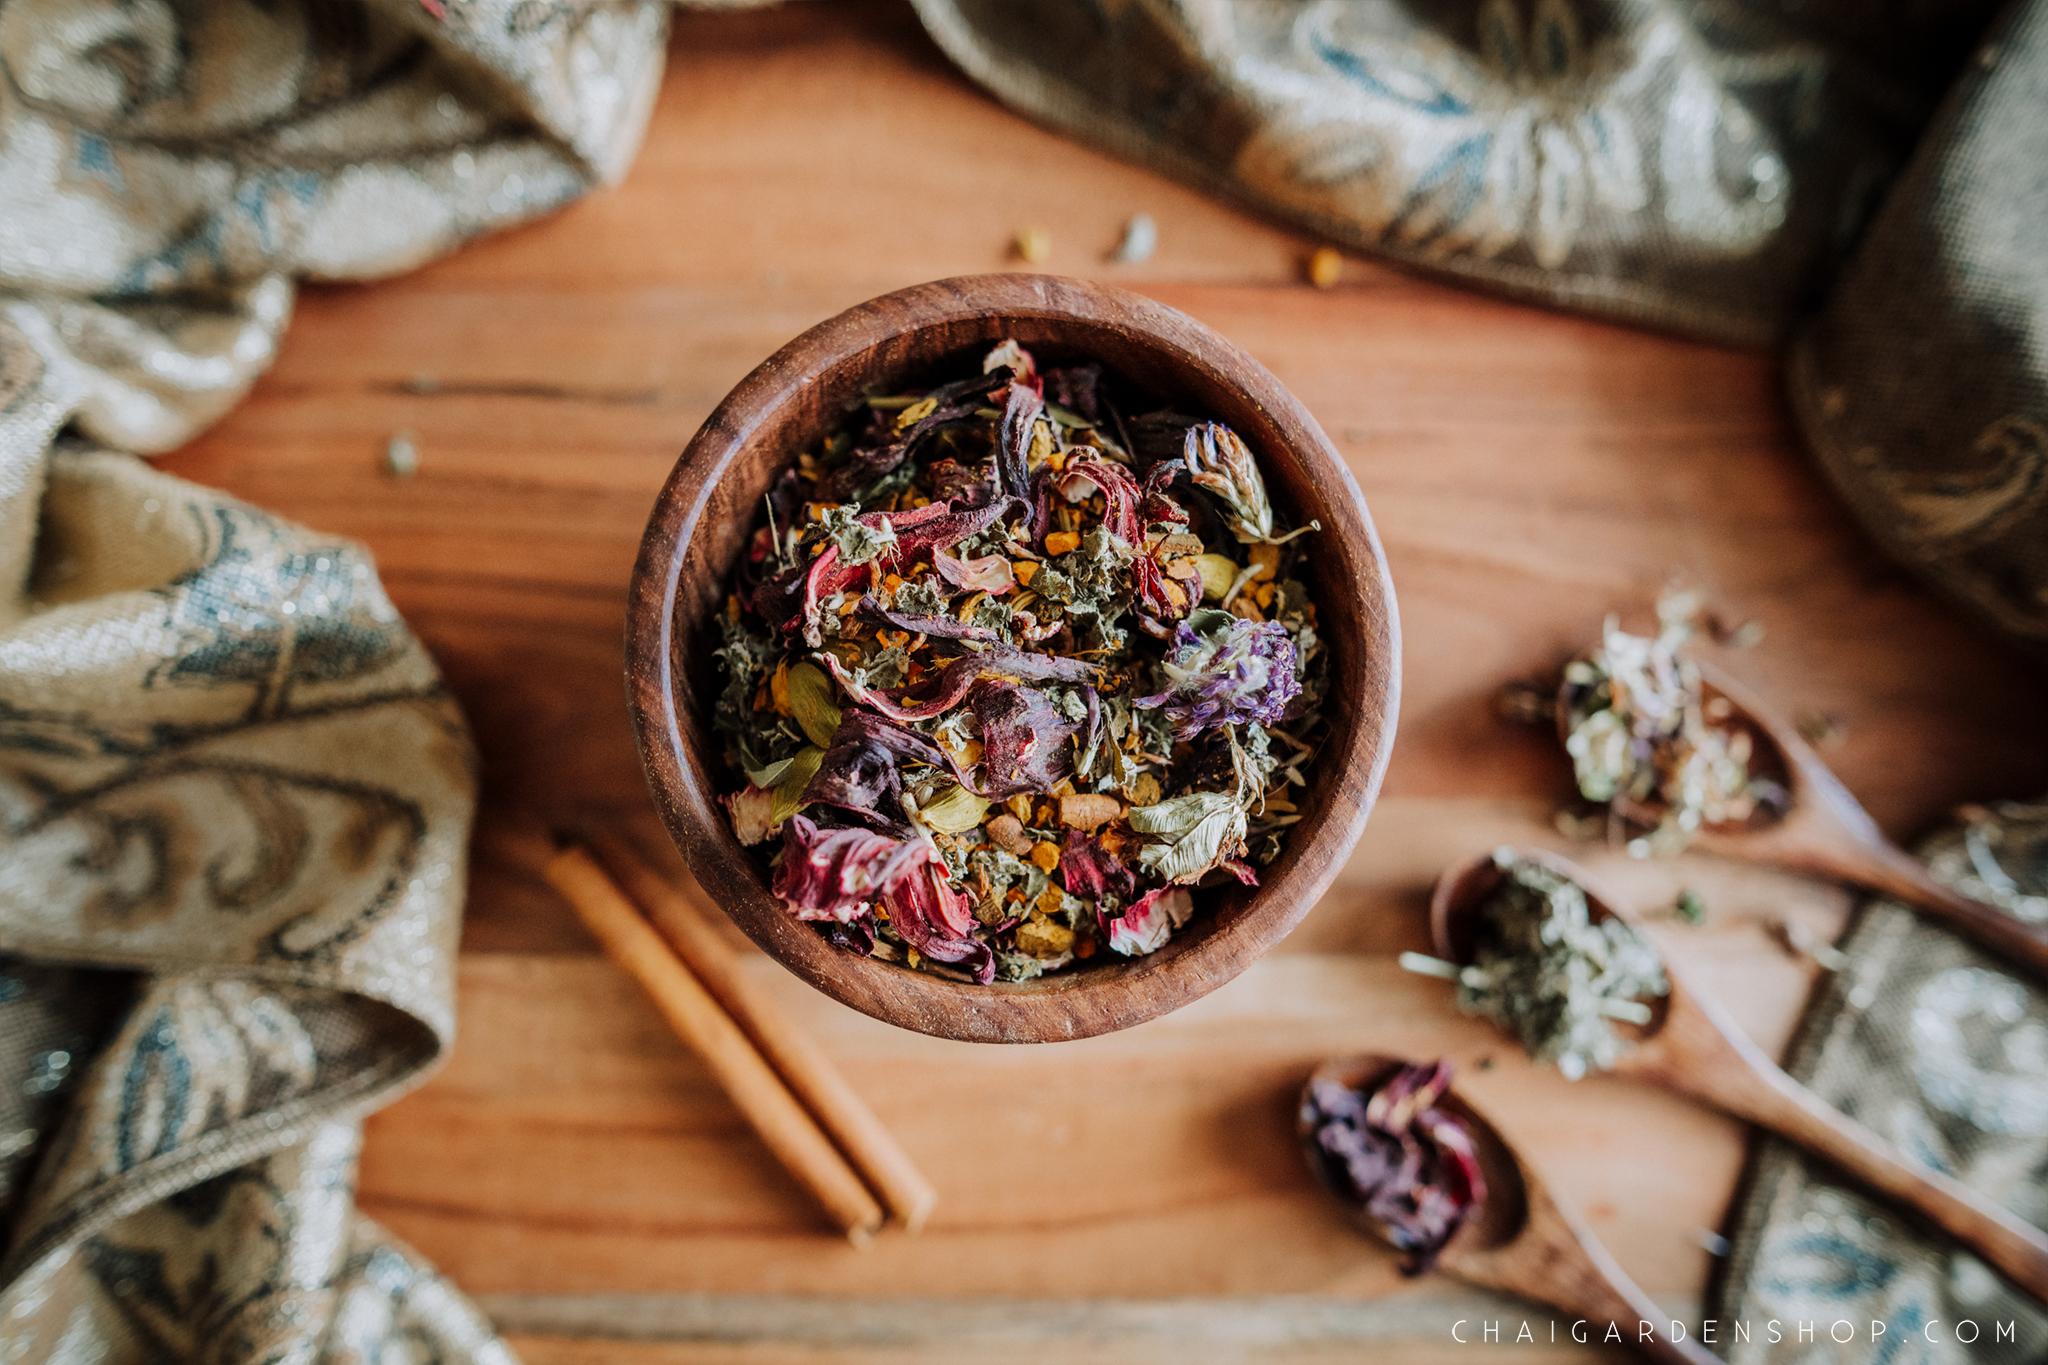 women's-wellness-tea,-well-woman-chai,-women's-health-chai,-menstruation-tea-organic, chai garden, organic herbal chai, organic tea, spokane wa